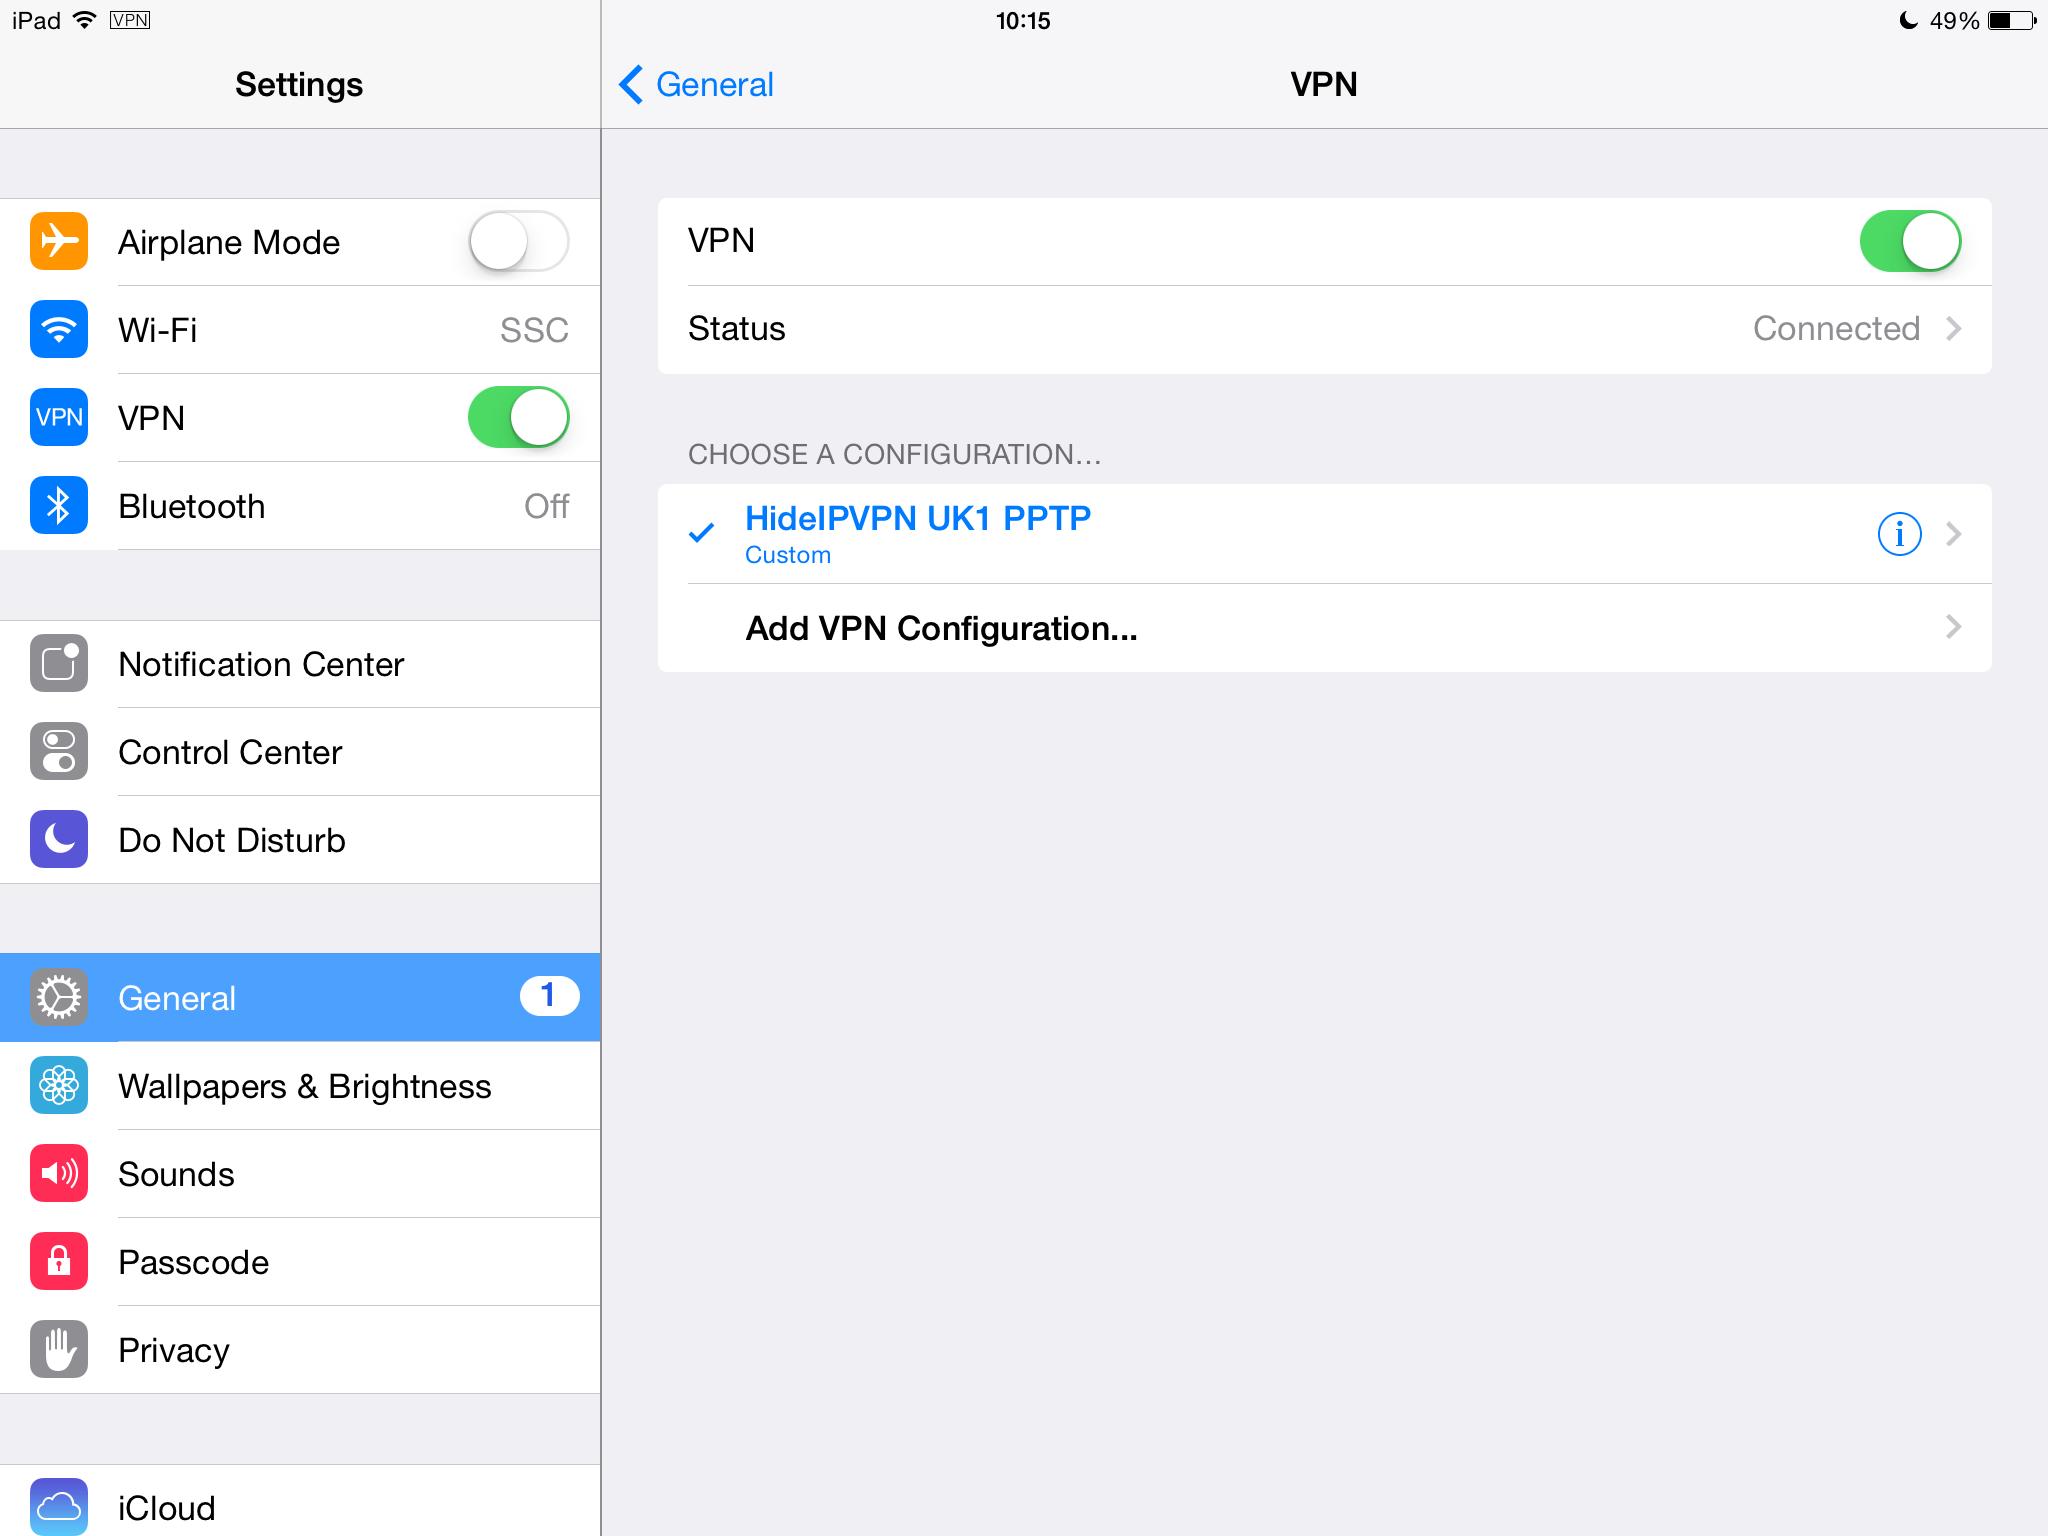 iPad PPTP VPN Setup Tutorial - HideIPVPN